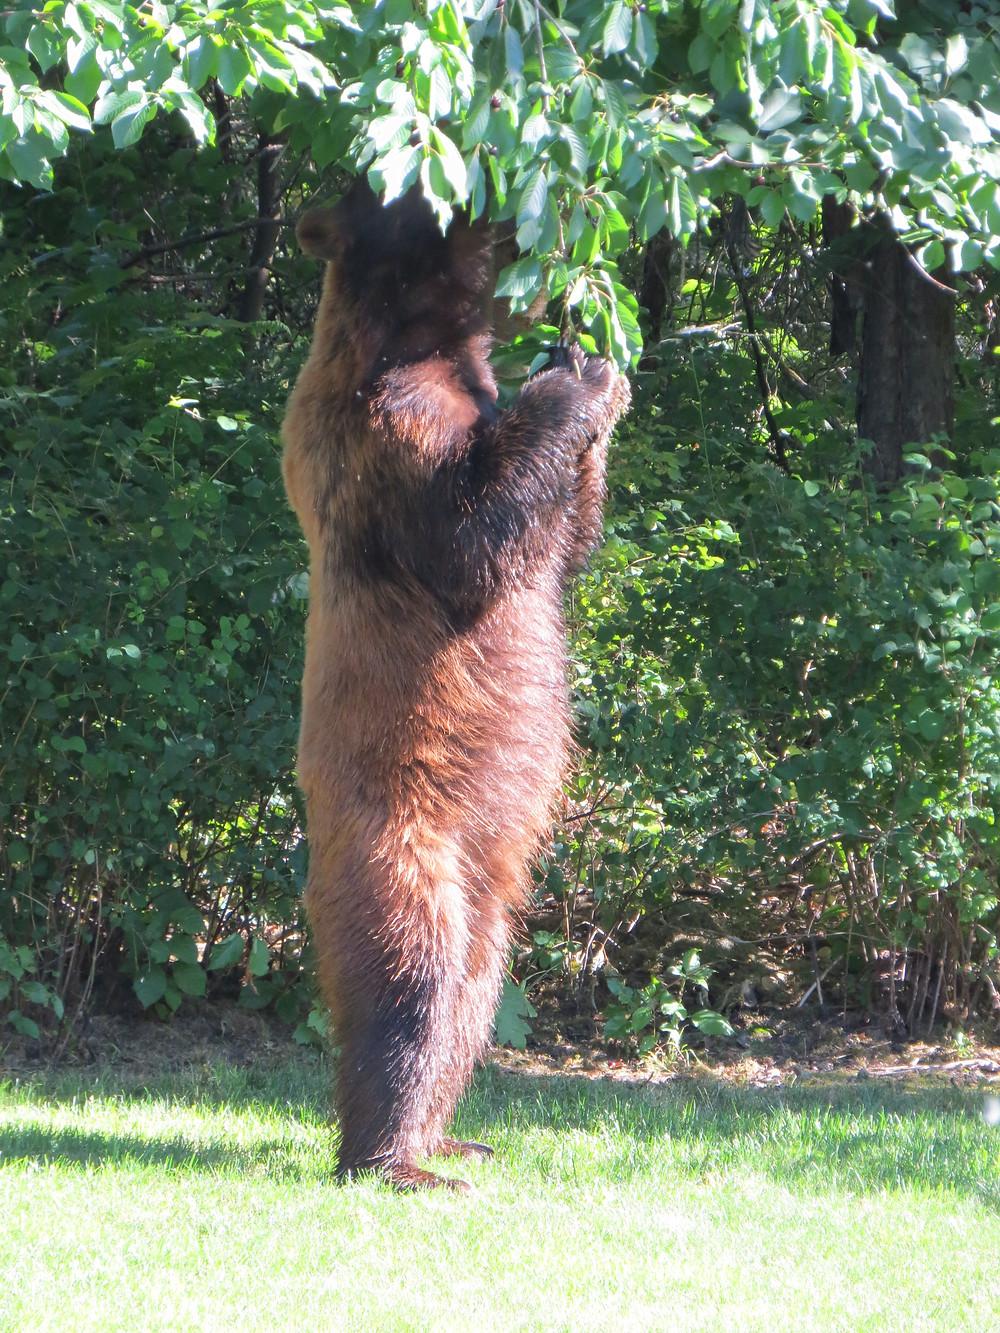 Bear Eating Cherries